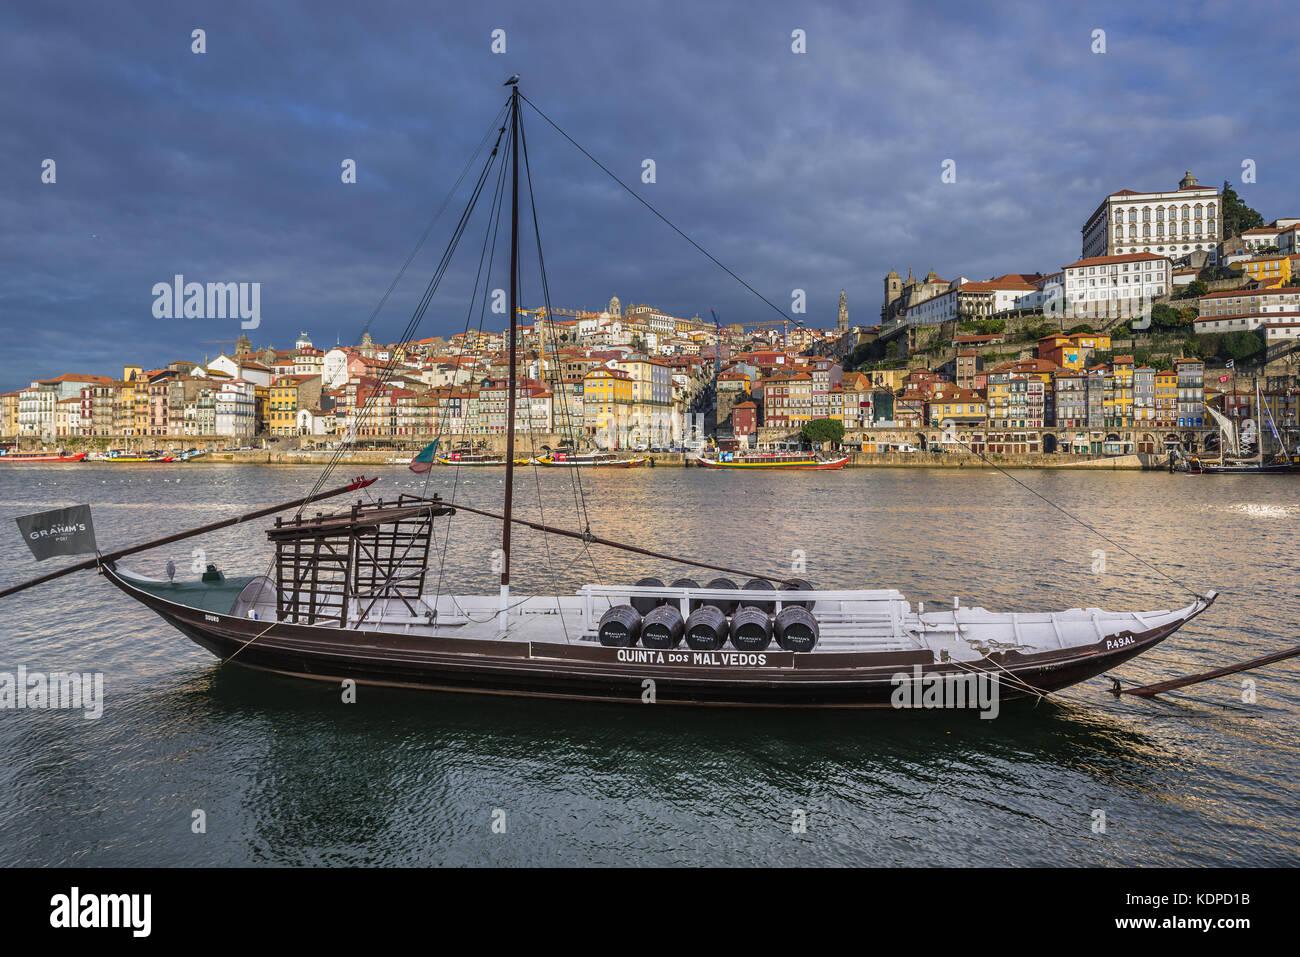 Graham's Port wine boat called Rabelo Boat on a Douro River in Vila Nova de Gaia city. Porto city river bank on Stock Photo